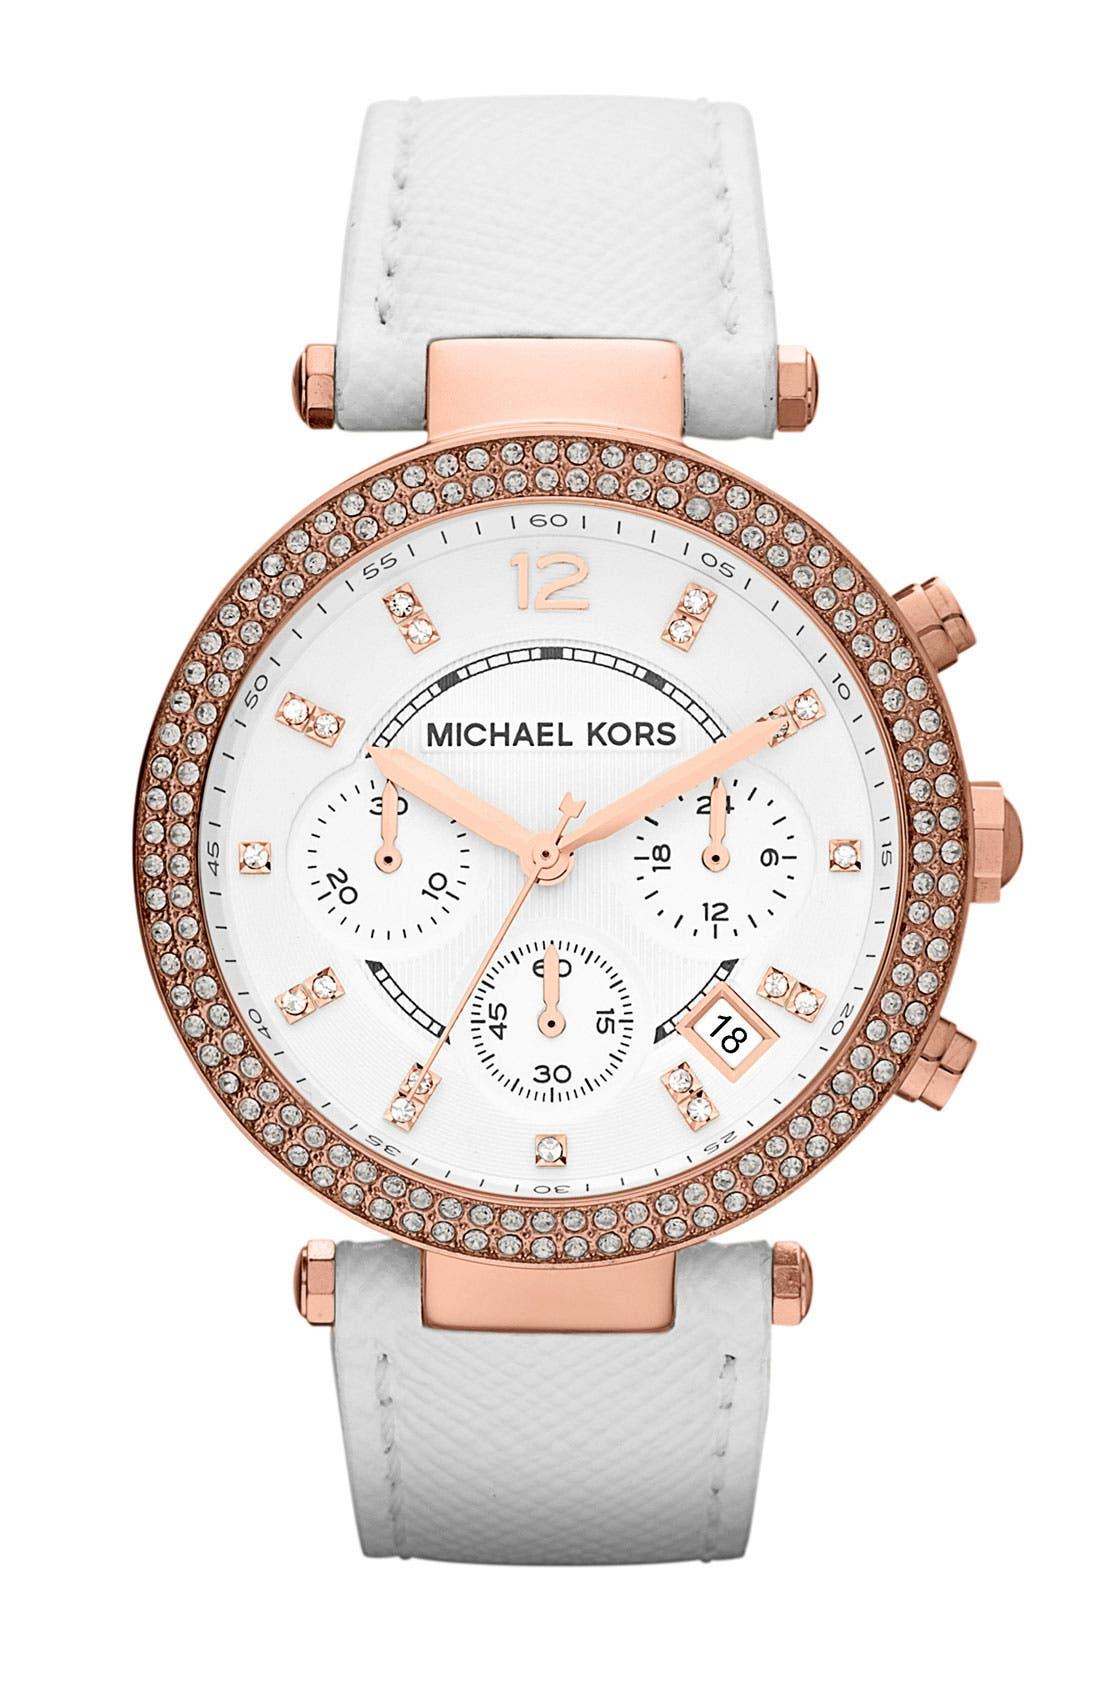 Michael Kors 'Parker' Chronograph Leather Watch, 39mm,                             Main thumbnail 1, color,                             100